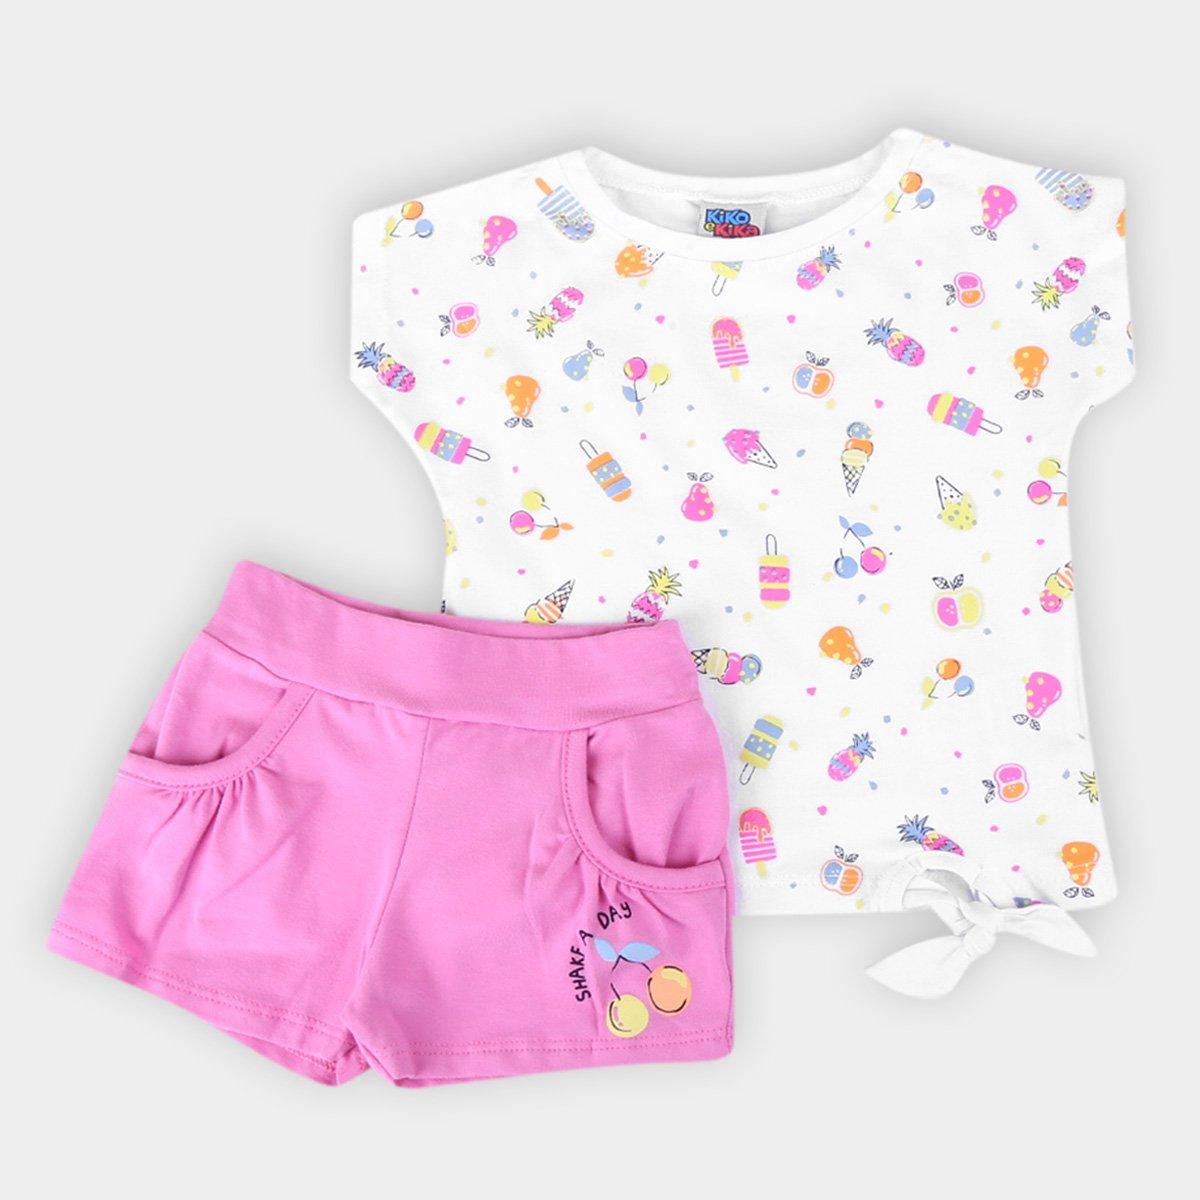 Conjunto Infantil Kiko & Kika Blusa E Shorts  Shakf Day Feminino